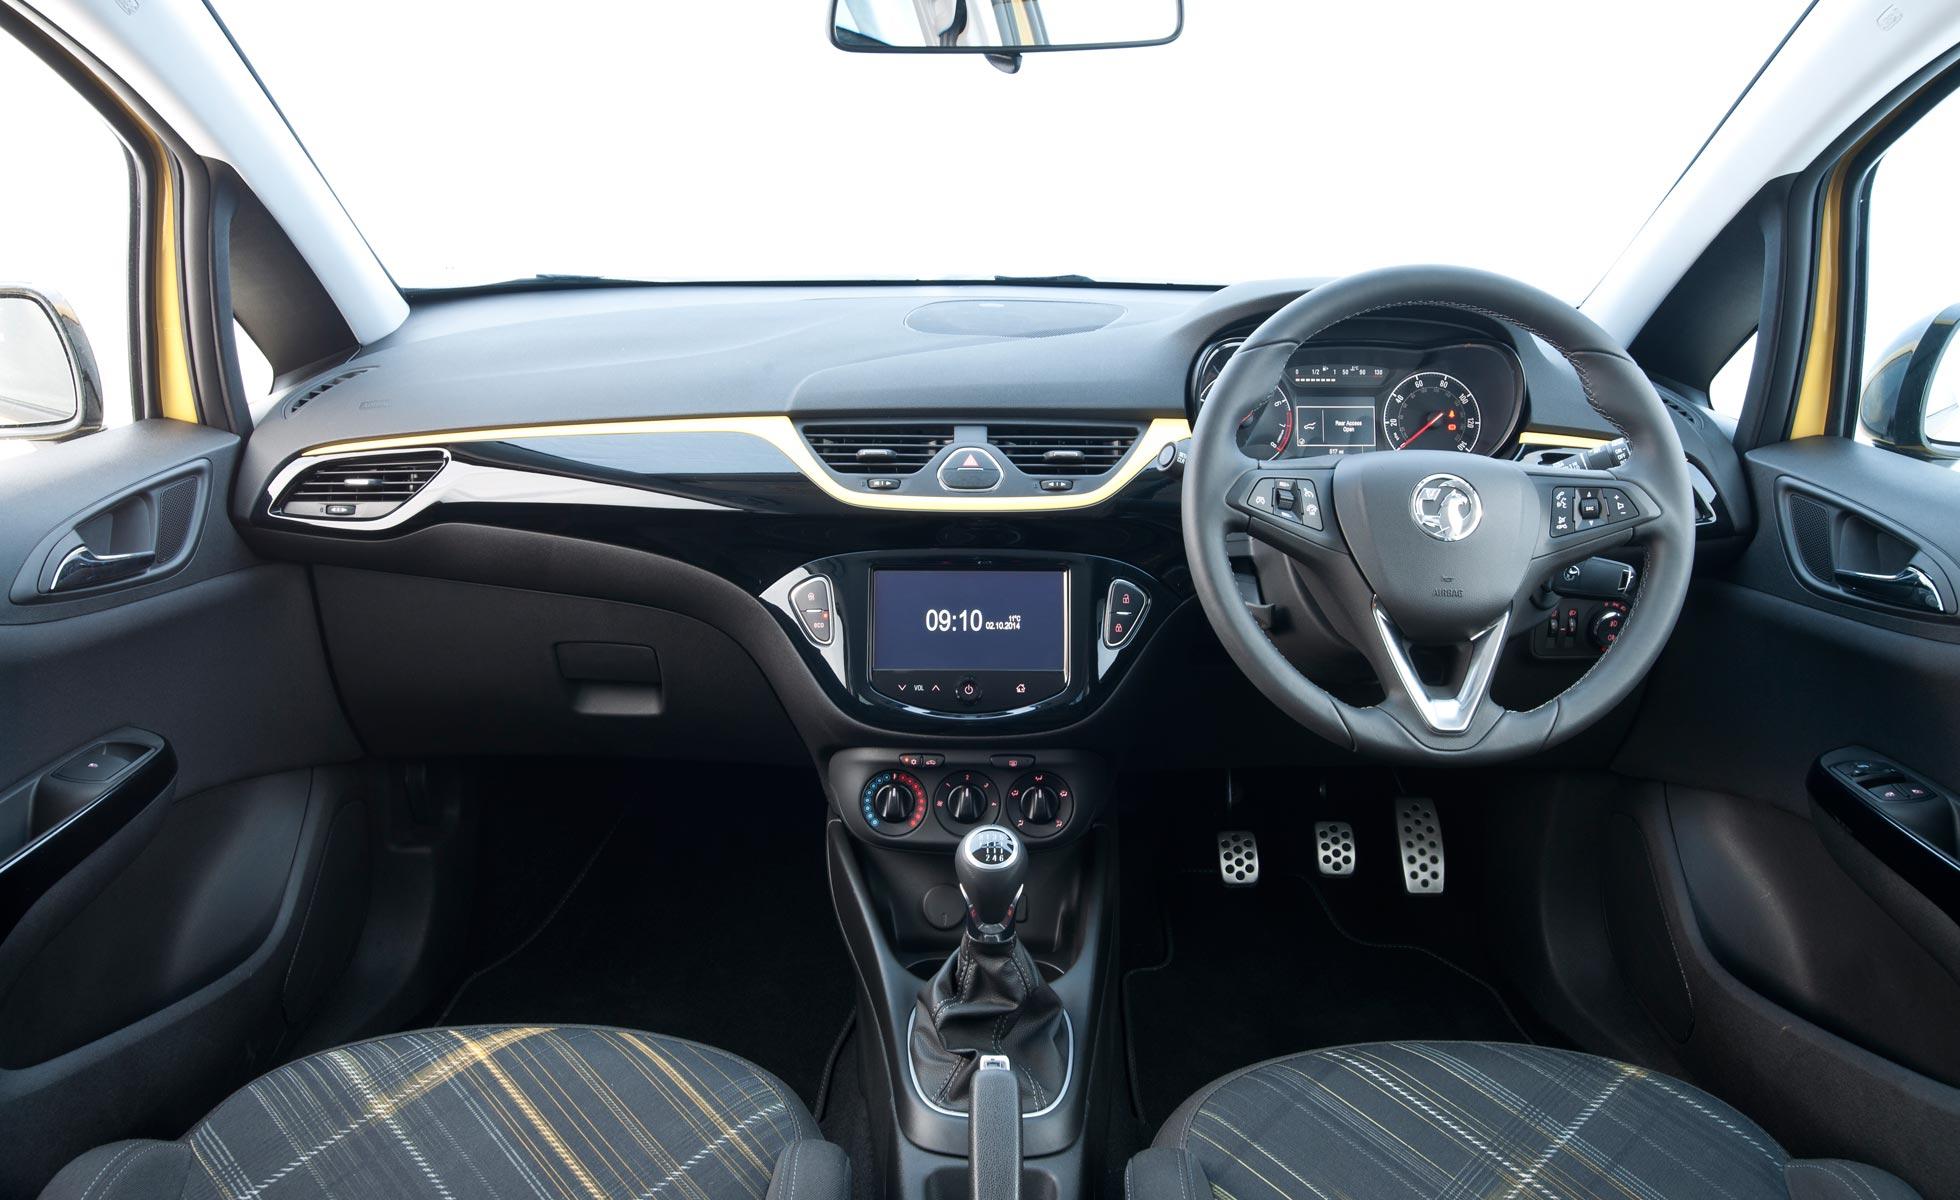 Vauxhall Corsa (2015)